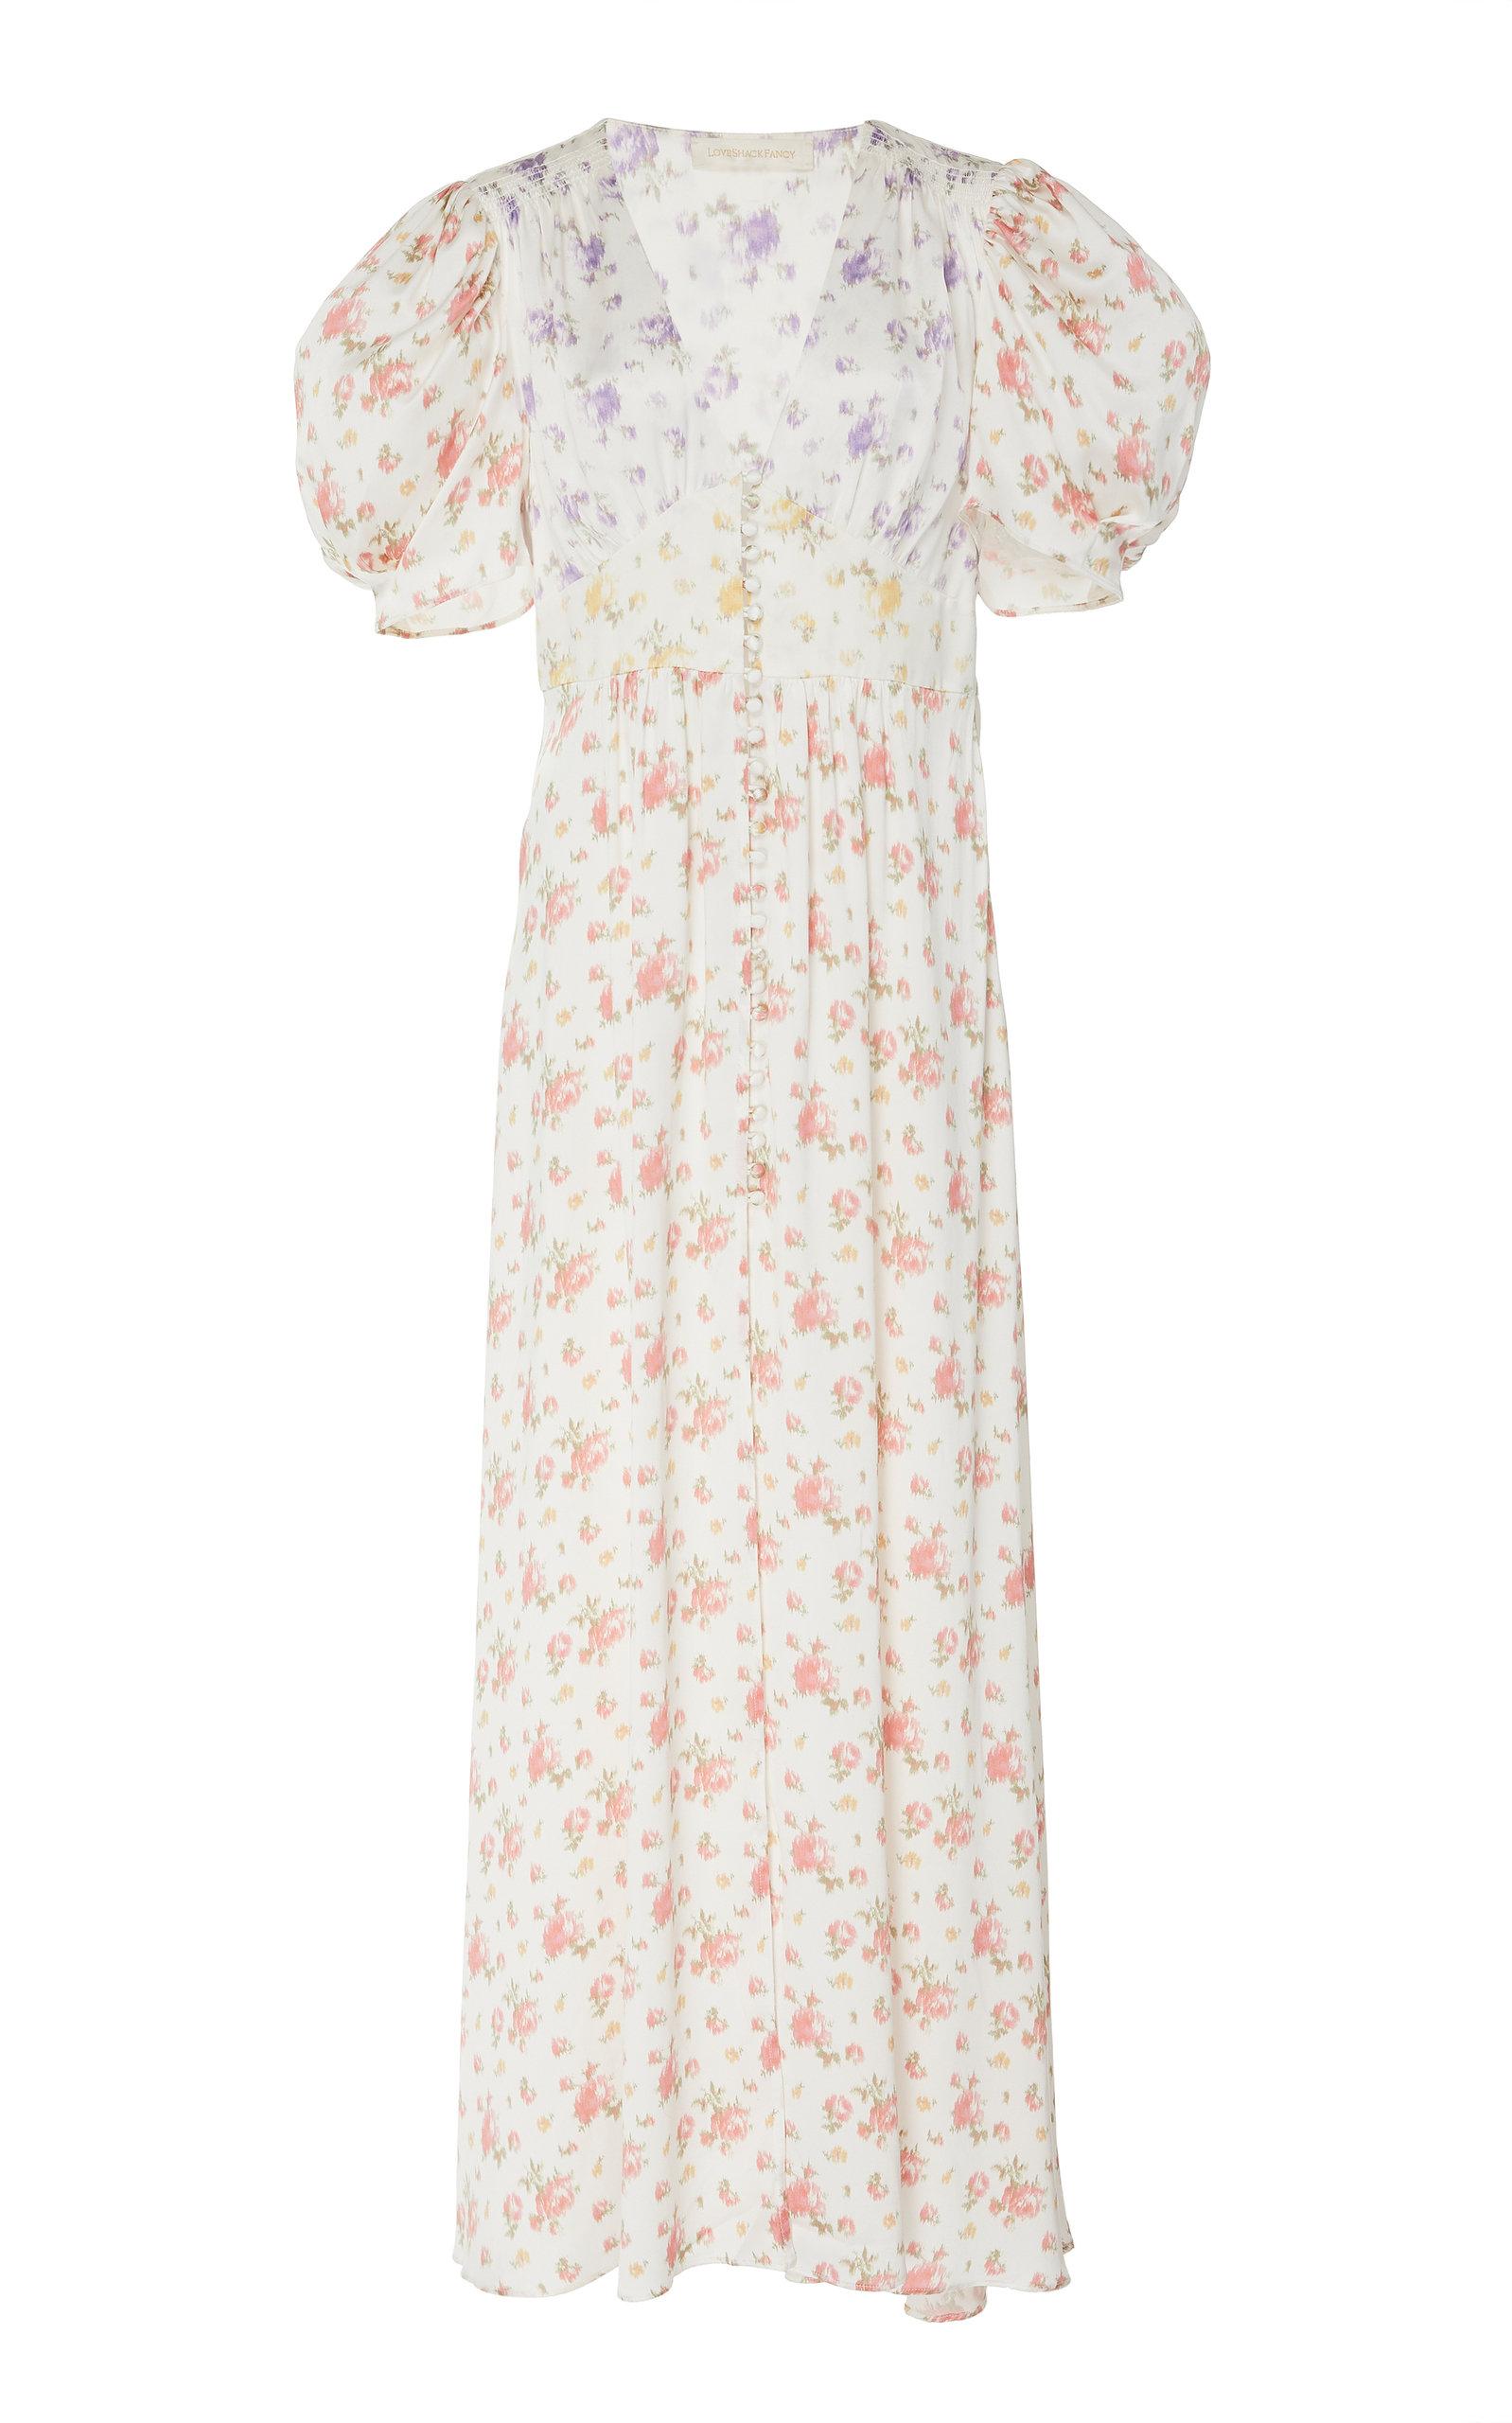 Loveshackfancy Dresses STACY FLORAL-PRINT SILK MAXI DRESS SIZE: 10